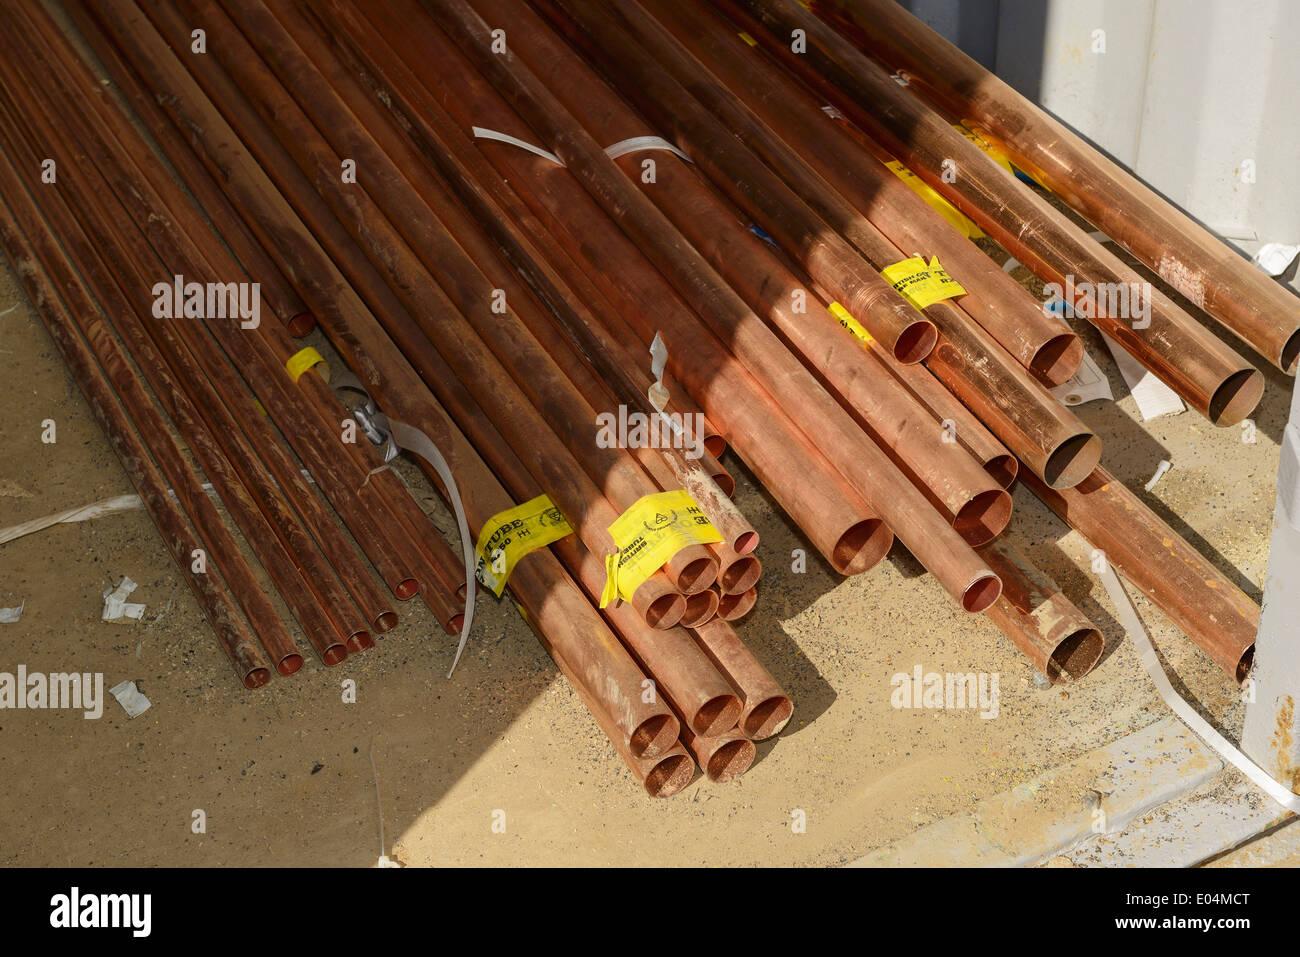 Lunghezze di tubo di rame Immagini Stock